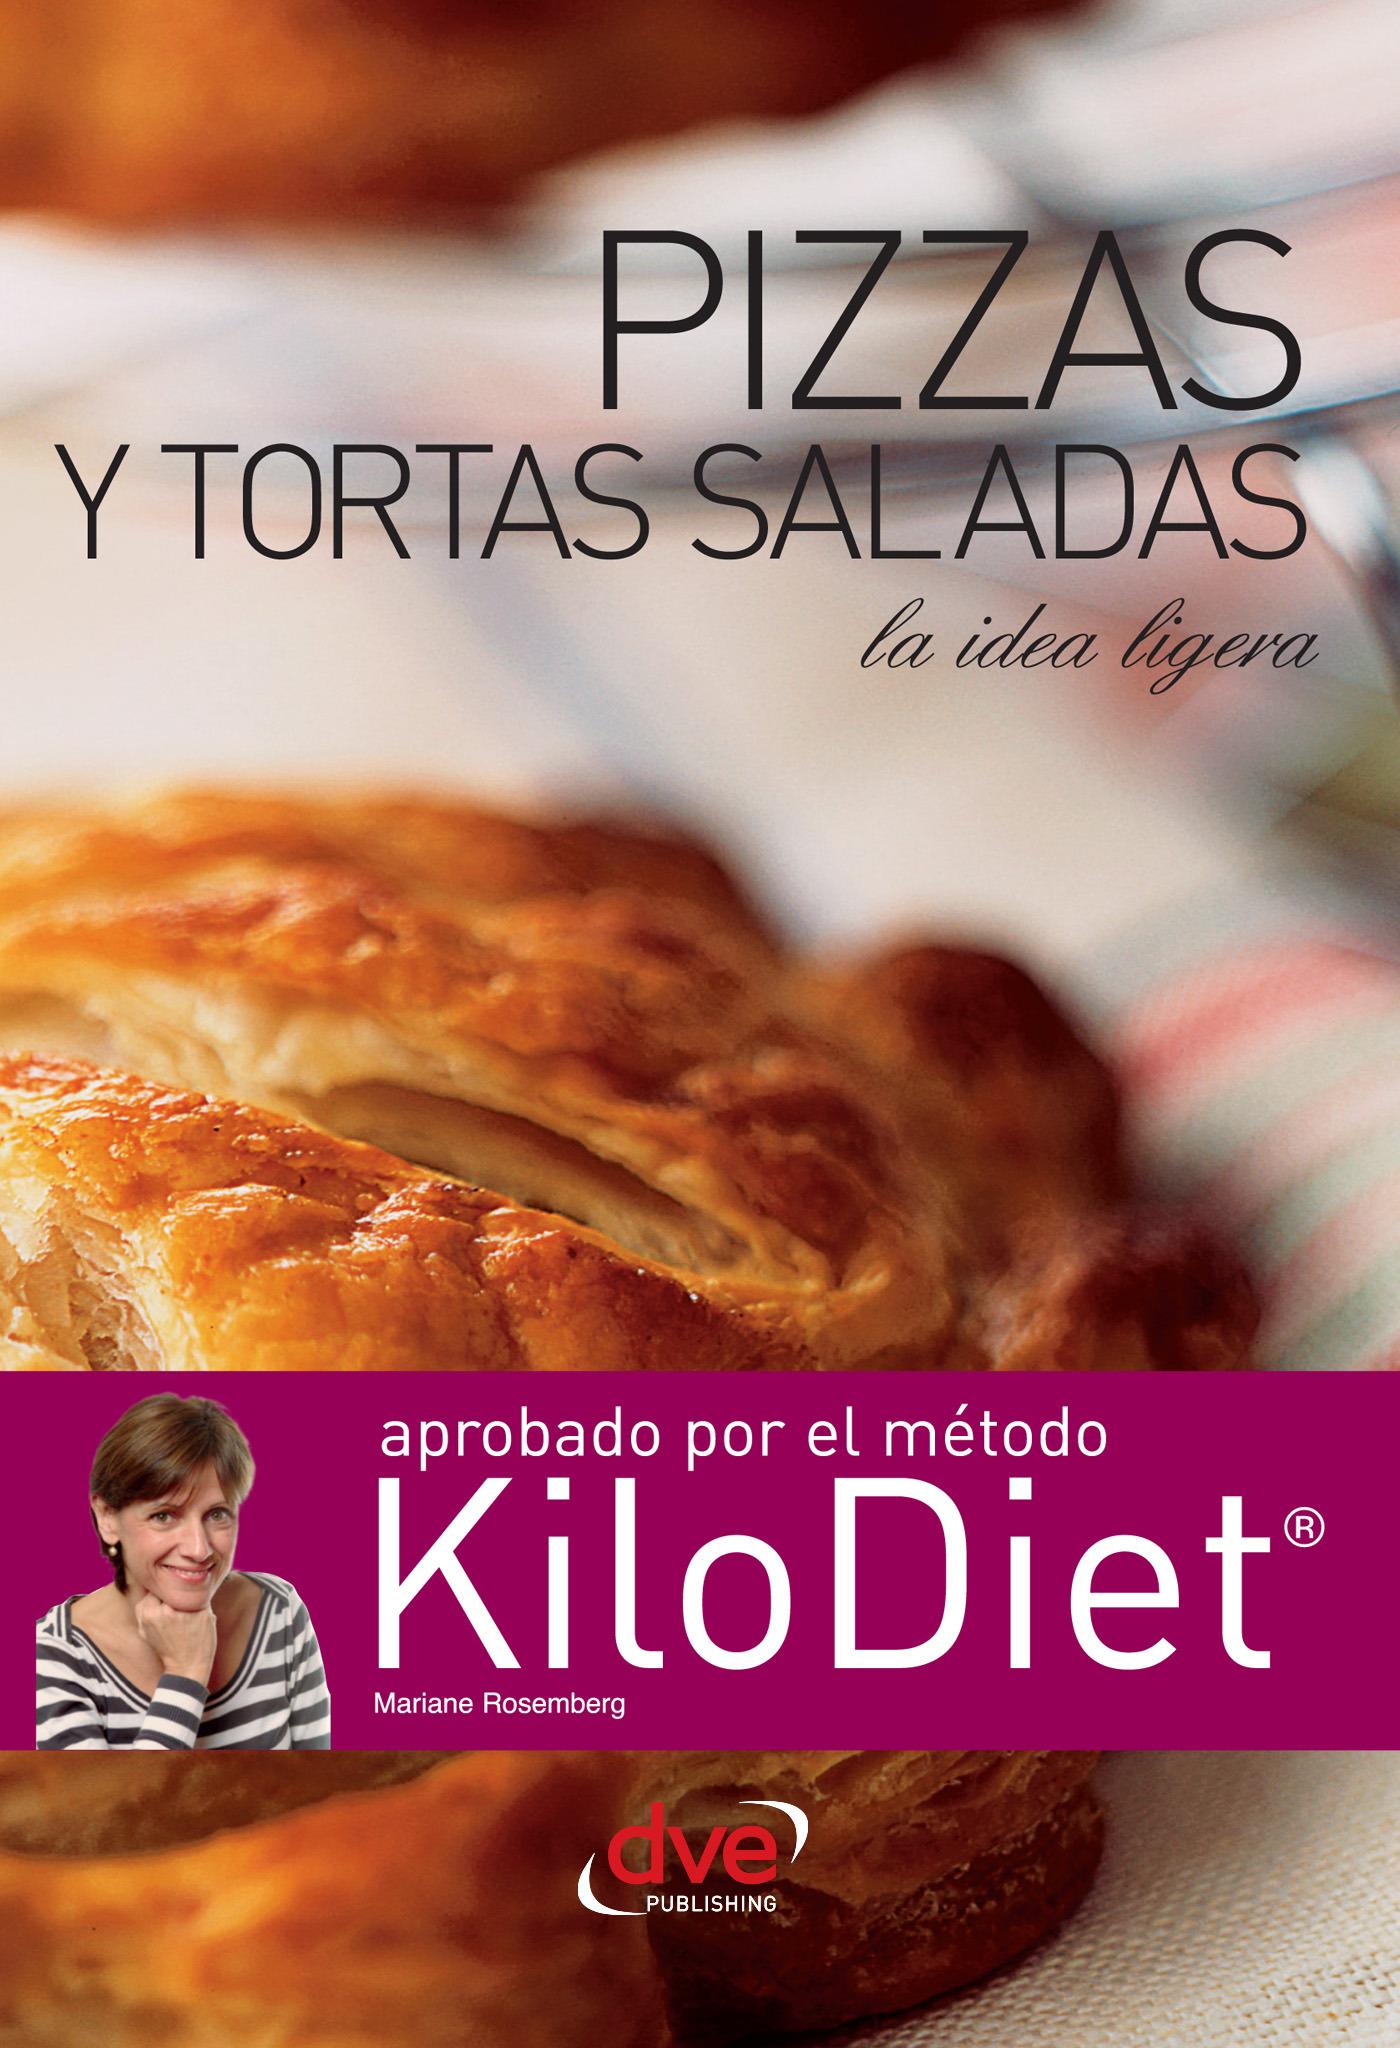 Rosemberg, Mariane - Pizzas y tortas saladas (Kilodiet), ebook